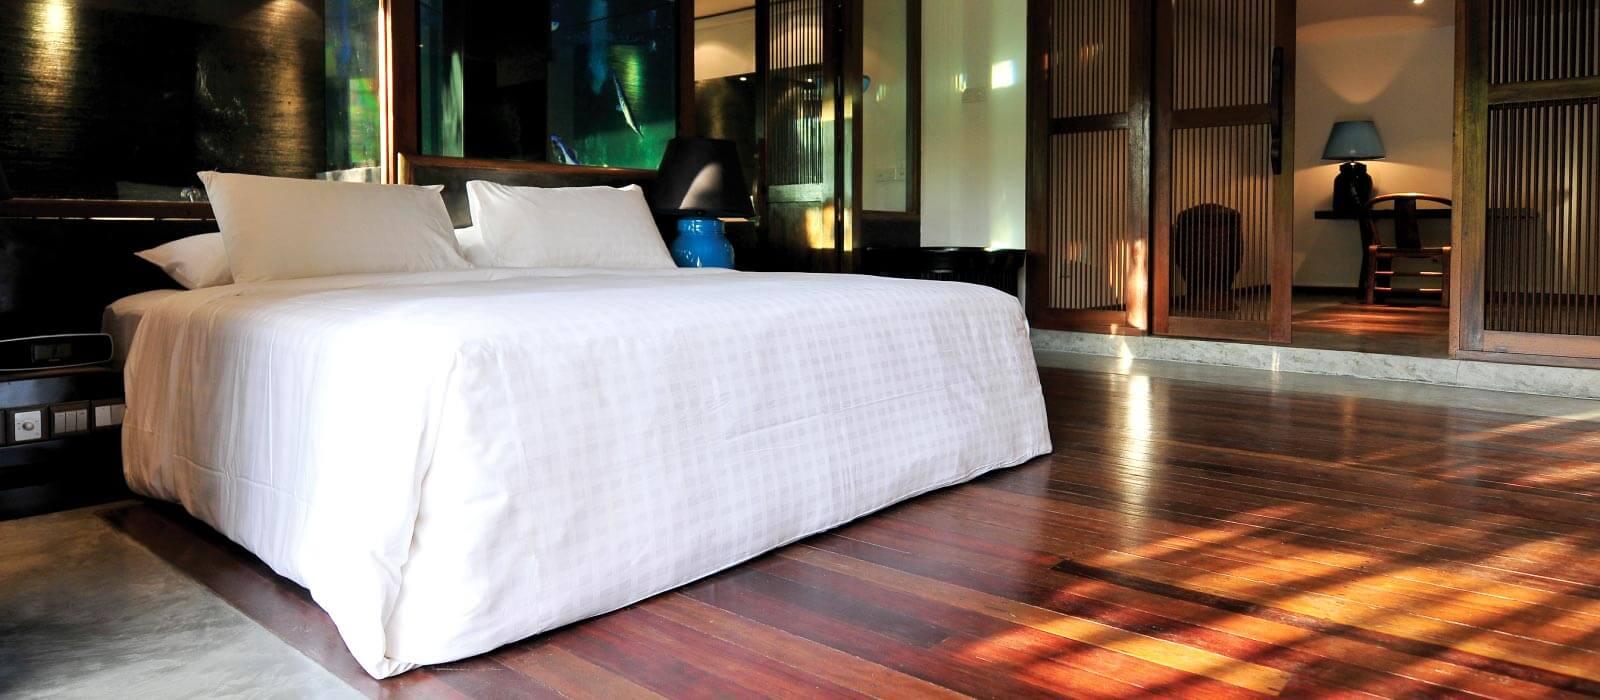 Luxe Crib Room